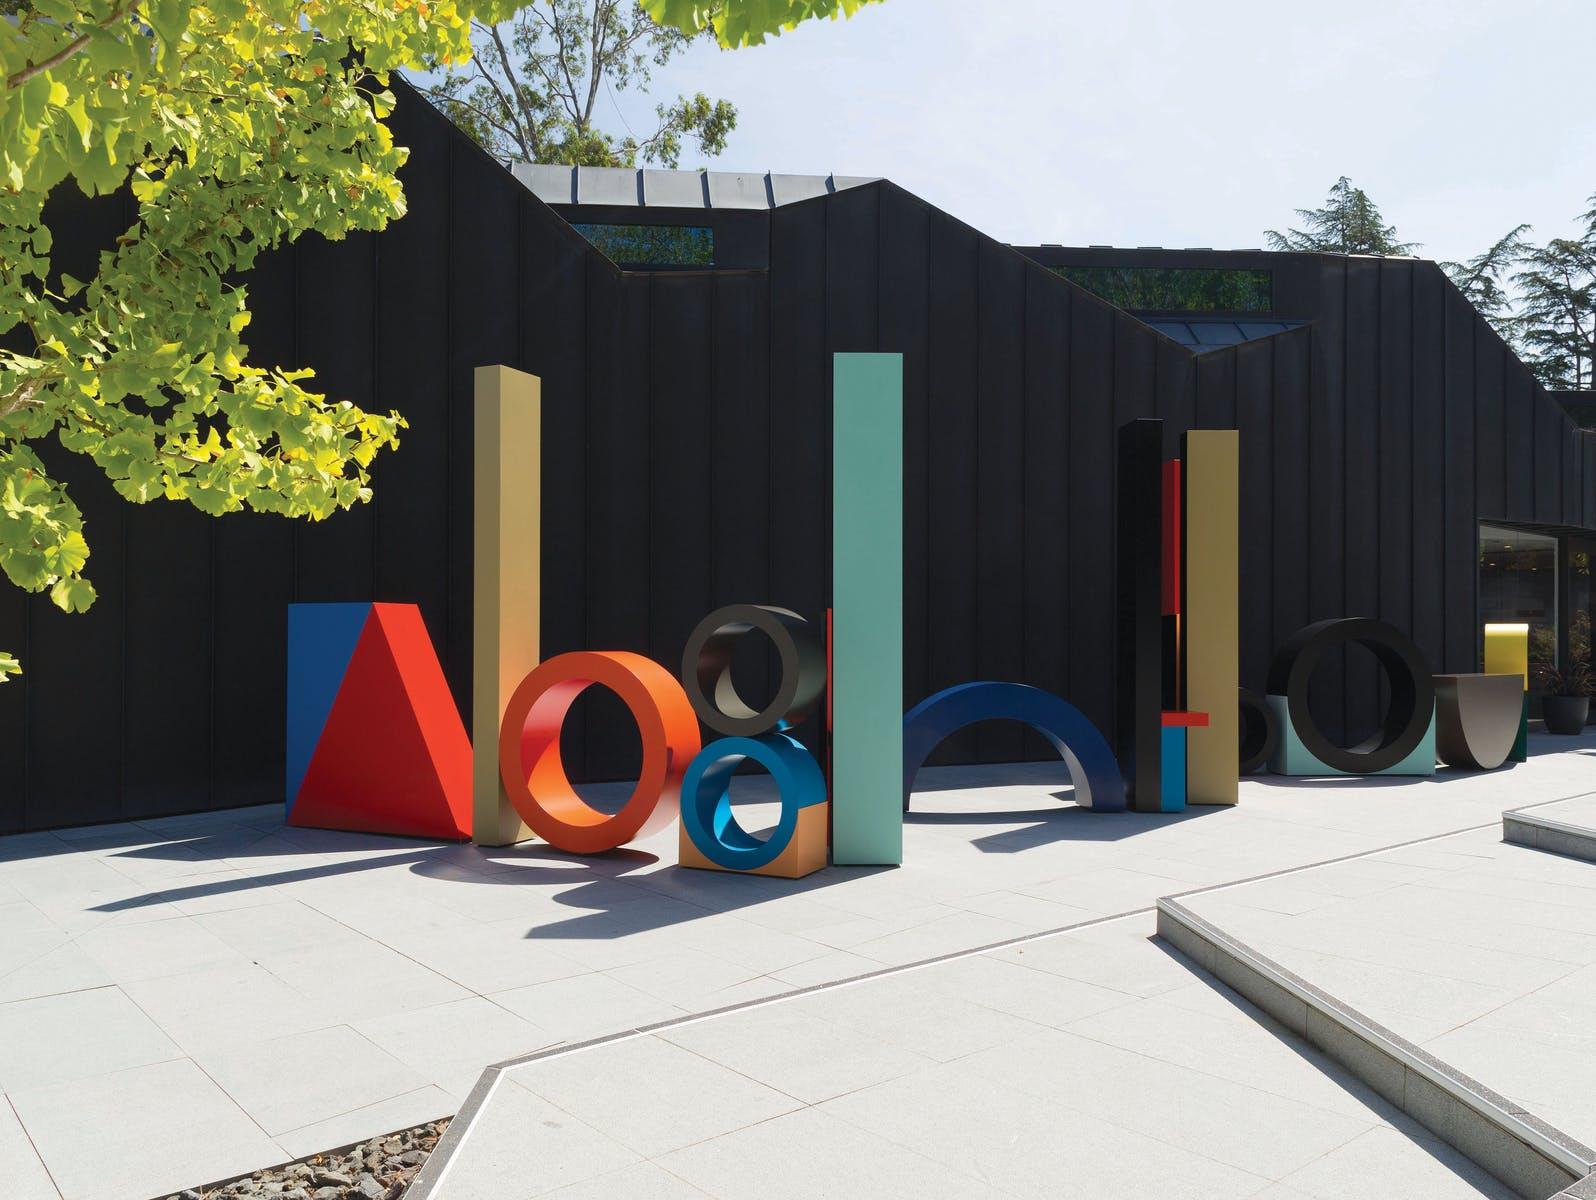 ^ rt galleries, rt and culture, Melbourne, Victoria, ustralia